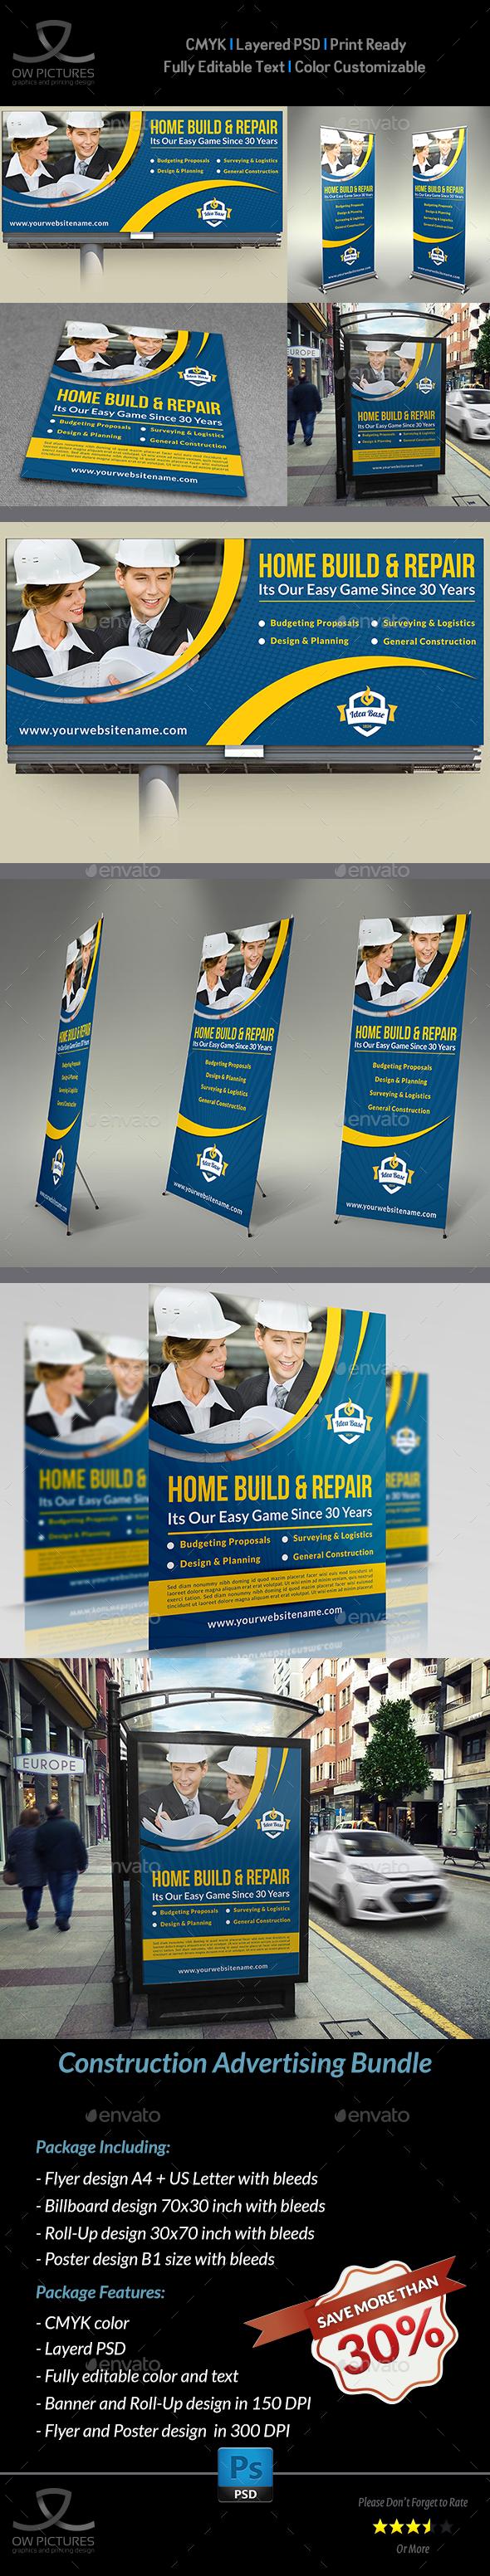 Construction Advertising Bundle Vol.2 - Signage Print Templates